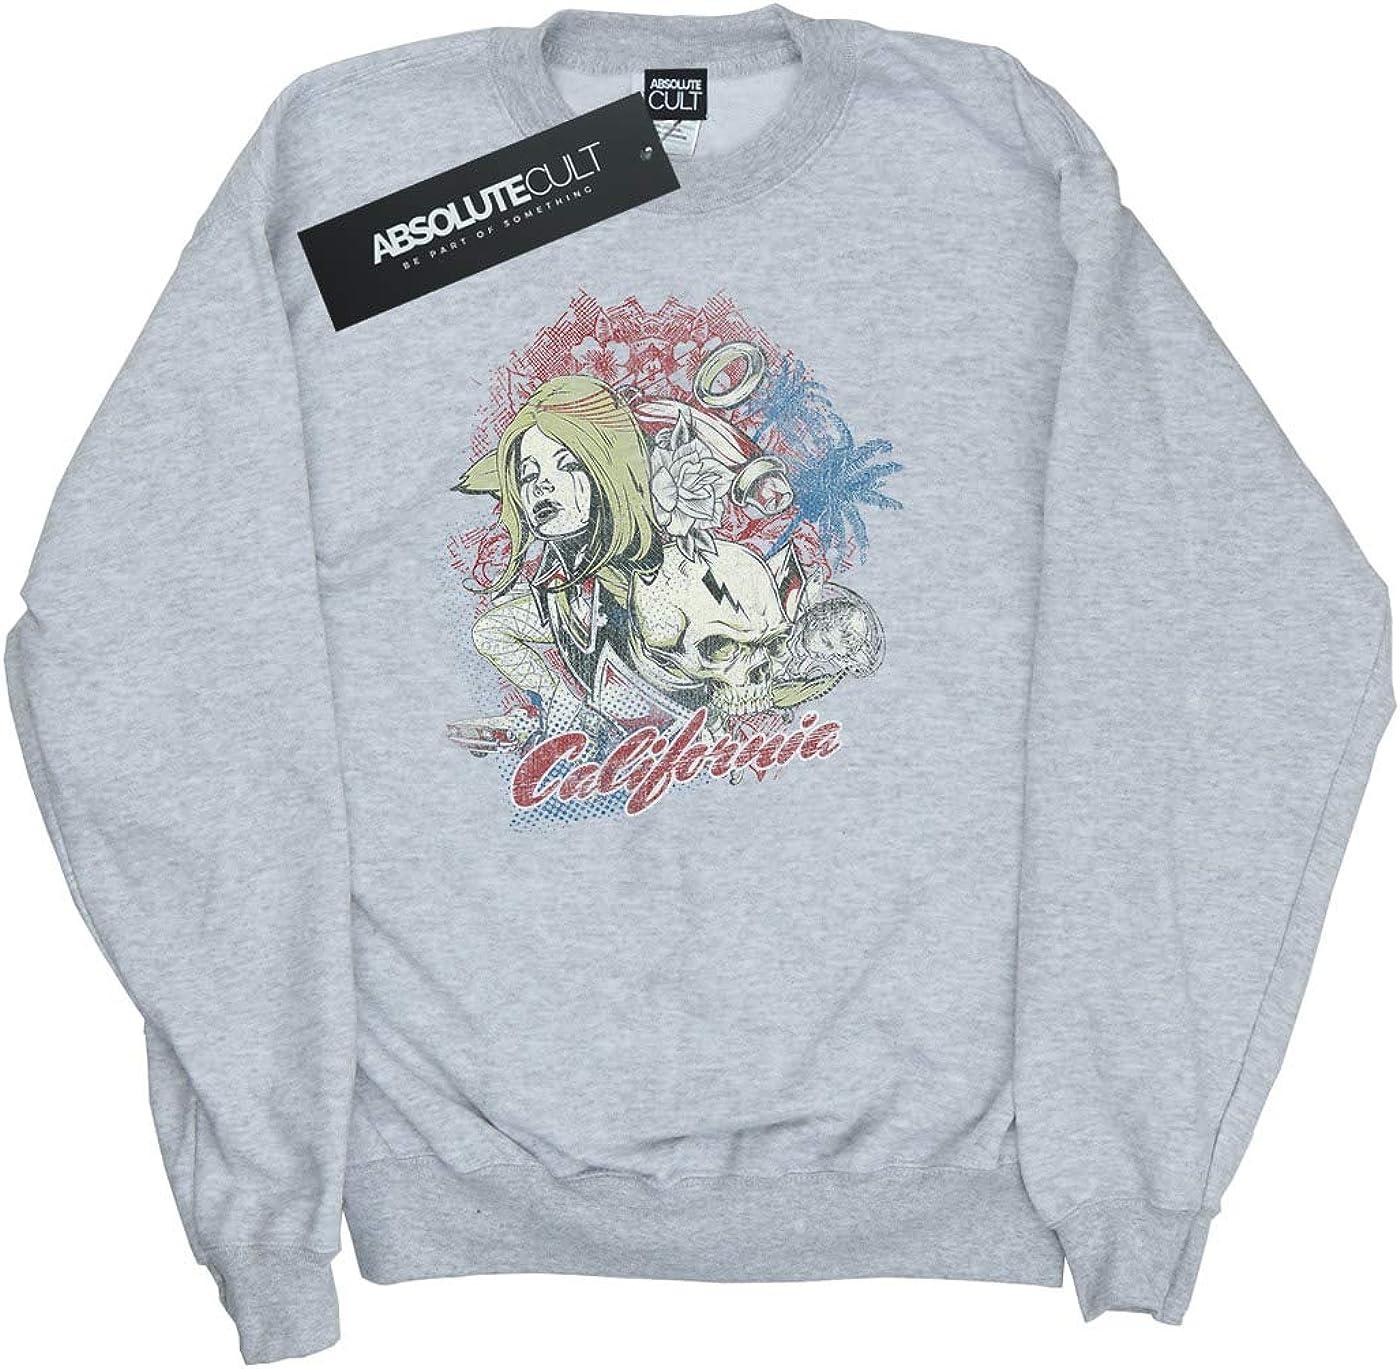 Absolute Cult Drewbacca Girls California Dreamin Sweatshirt